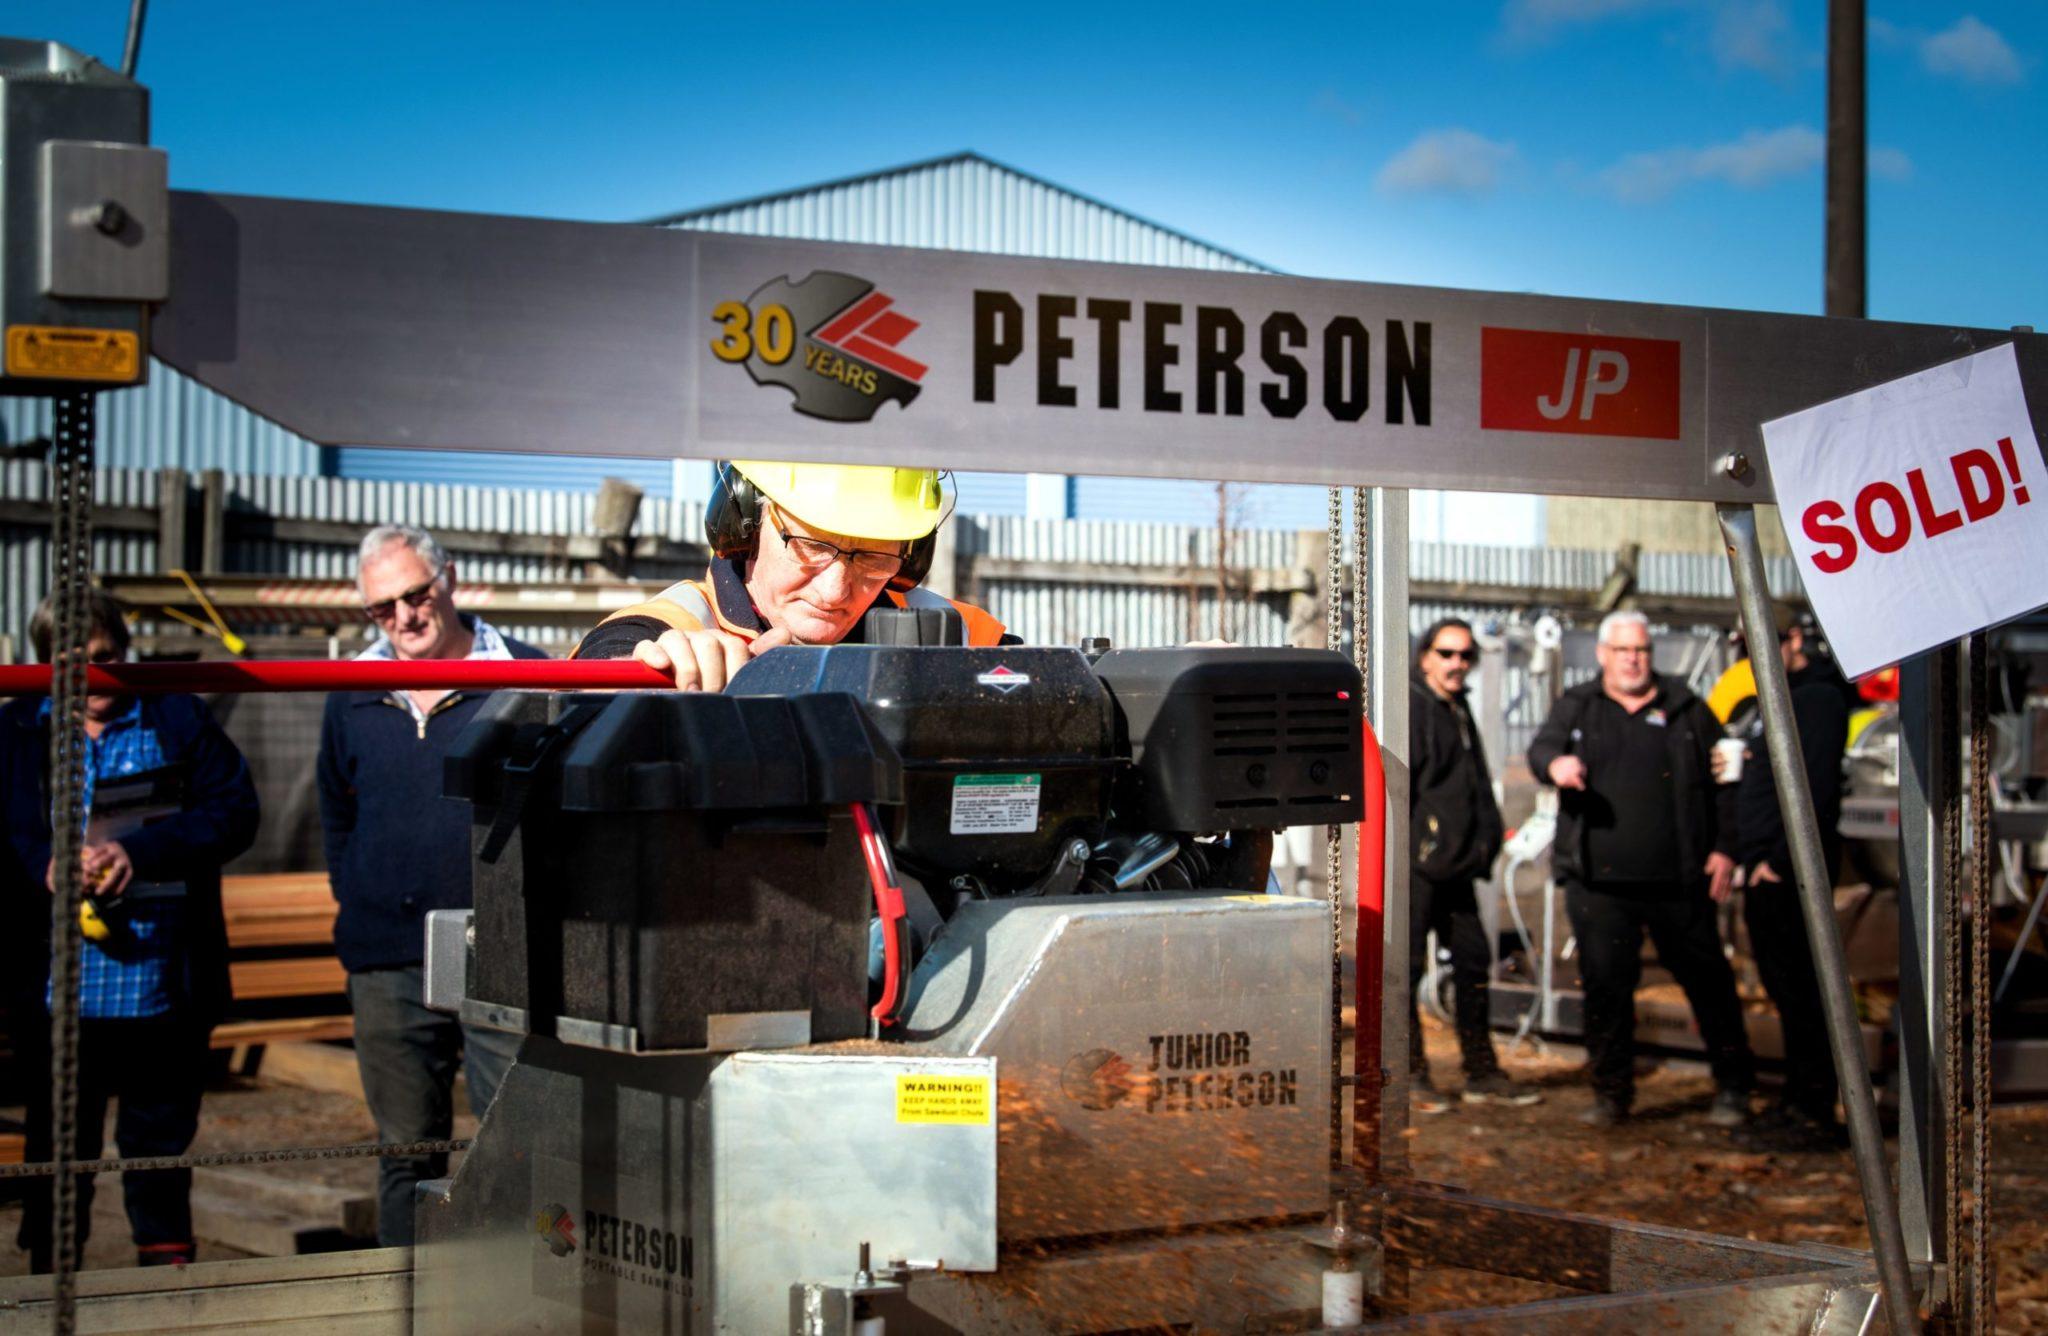 Peterson Sawmills Live Demonstration